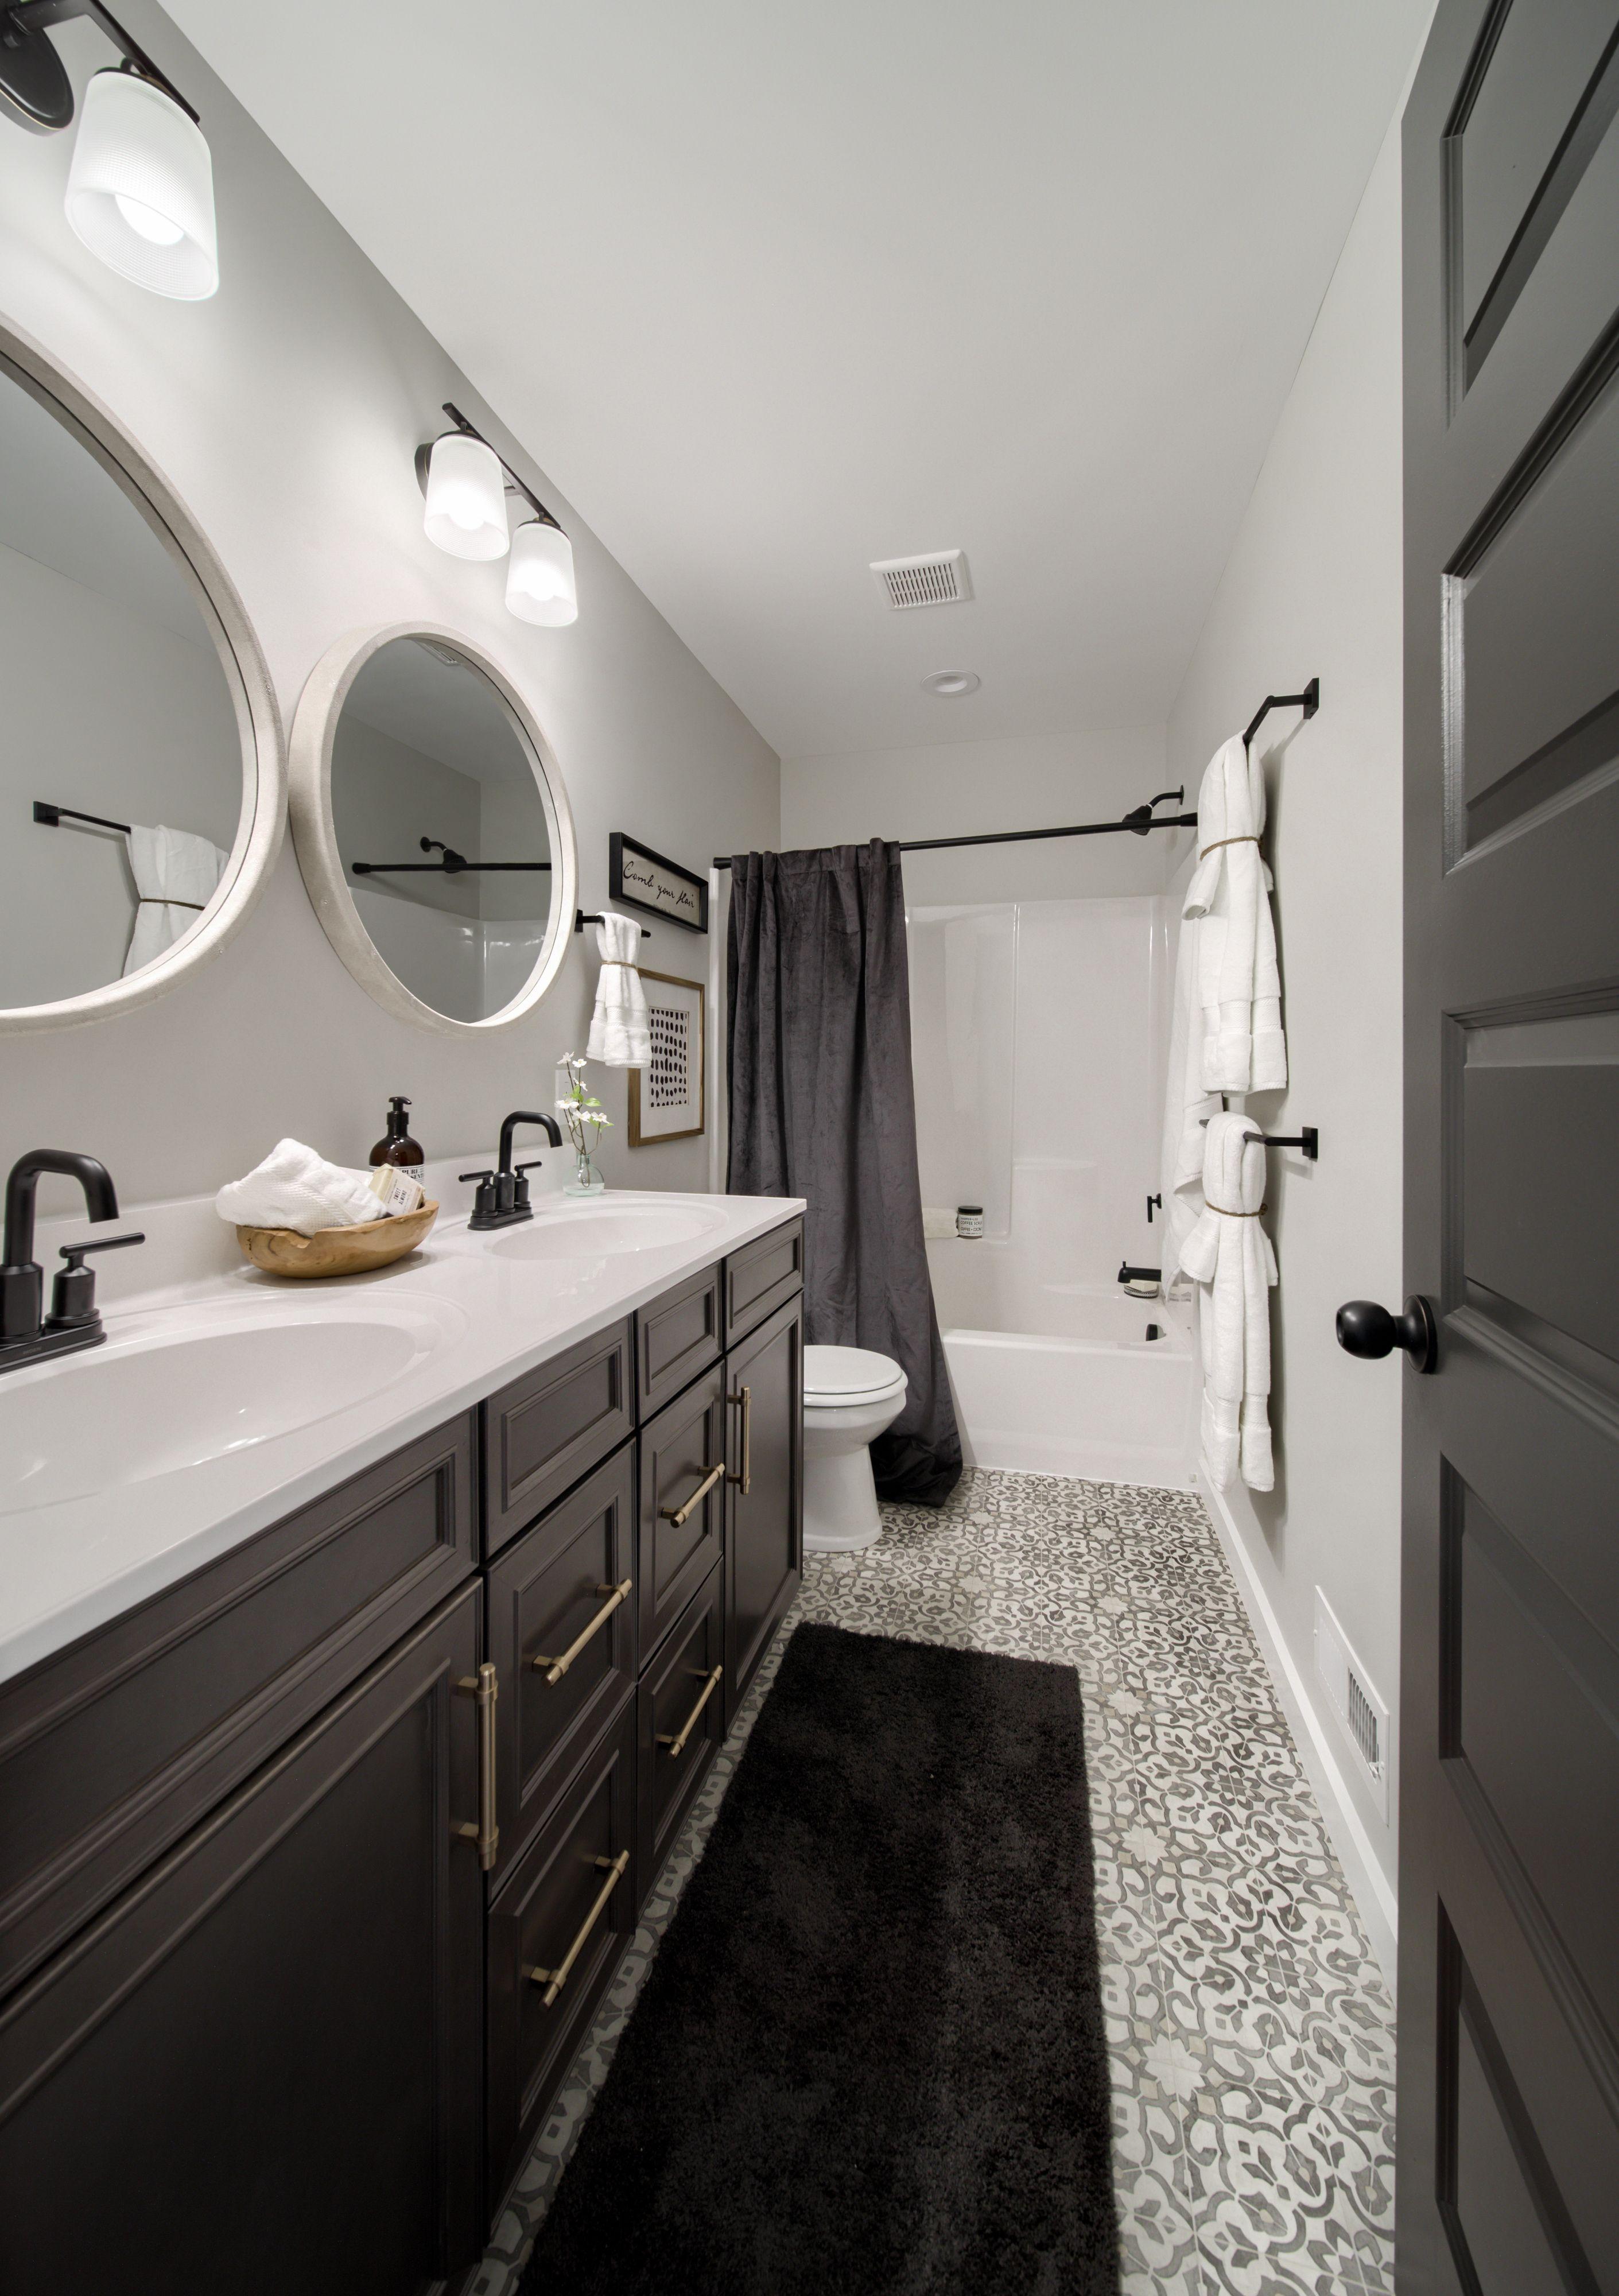 Bathroom featured in the Lachlan Vintage By Keystone Custom Homes in Philadelphia, PA